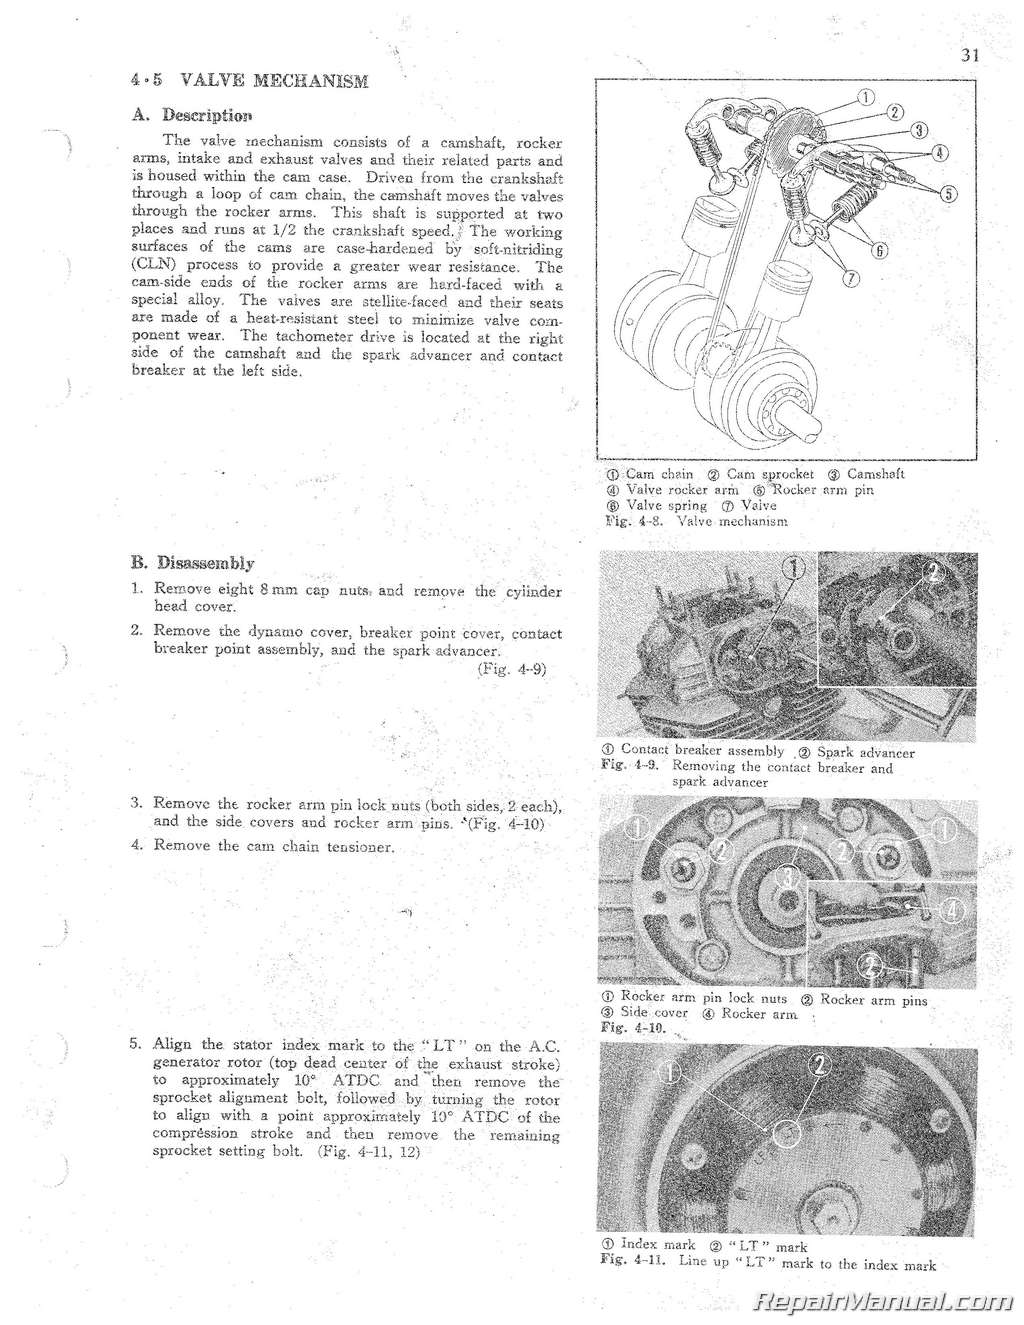 1968 1973 honda cb cl 250 cb cl sl350 motorcycle shop manual. Black Bedroom Furniture Sets. Home Design Ideas